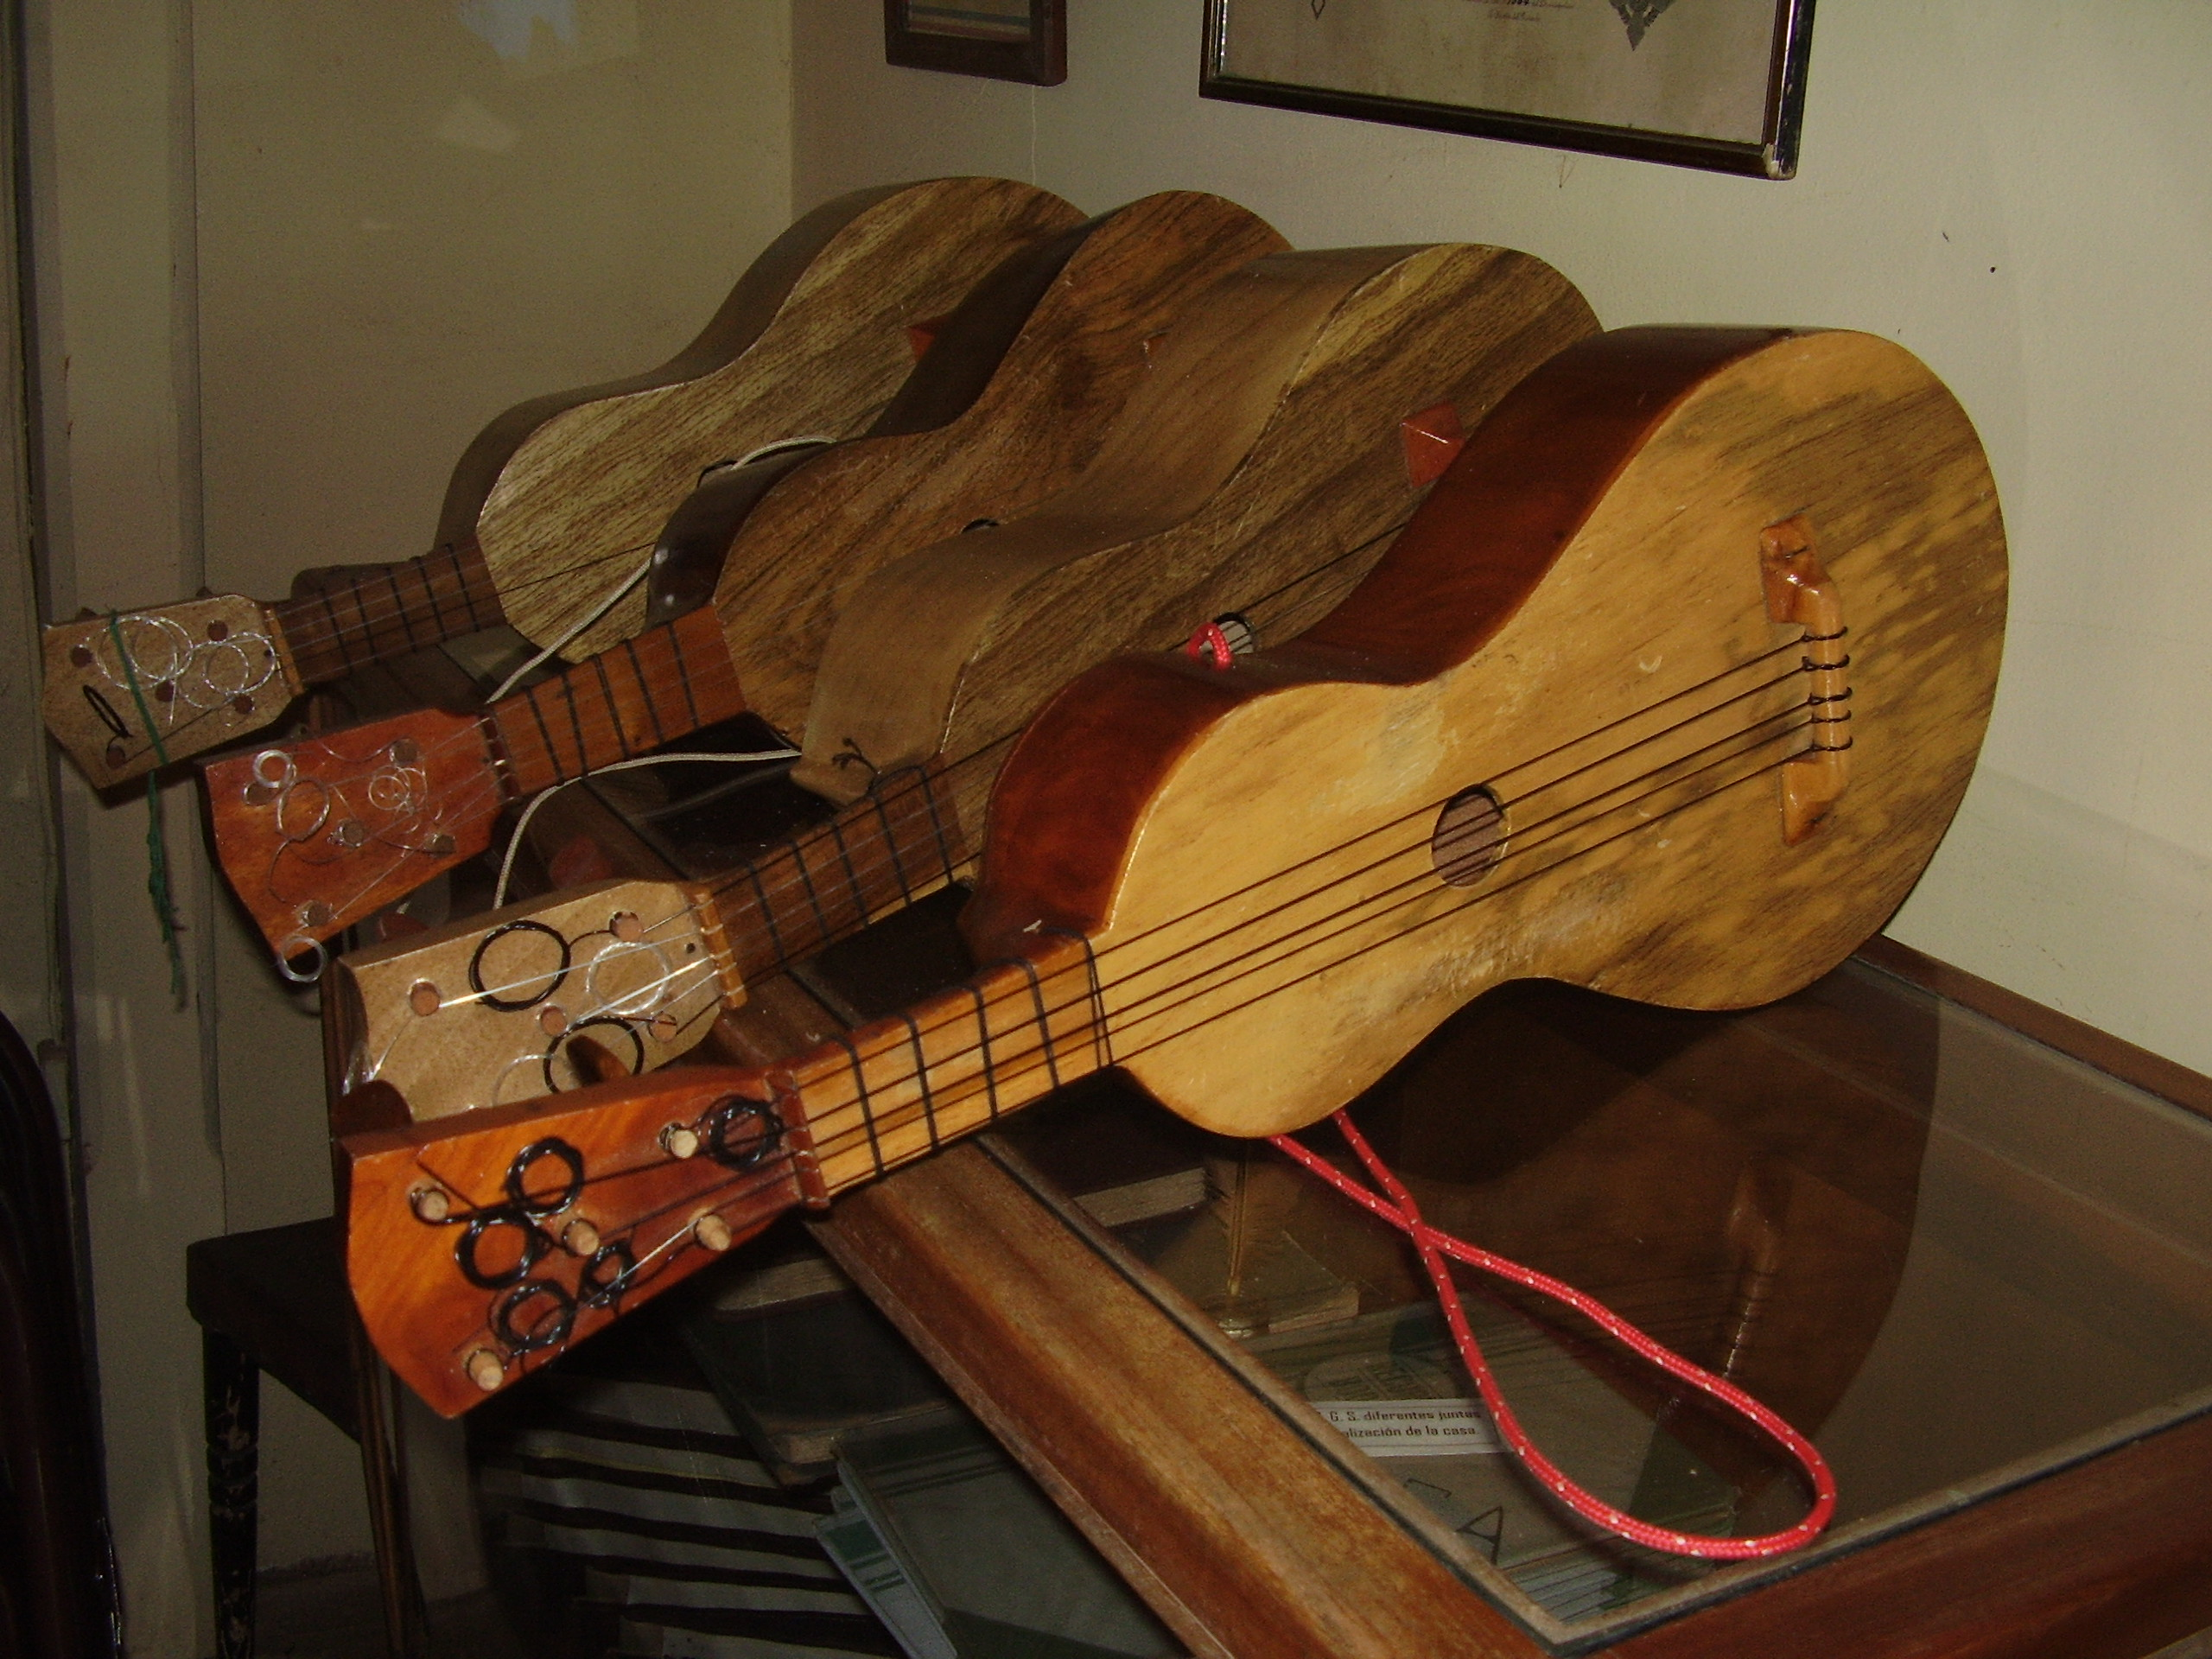 Mejorana Instrumento Musical Wikipedia La Enciclopedia Libre